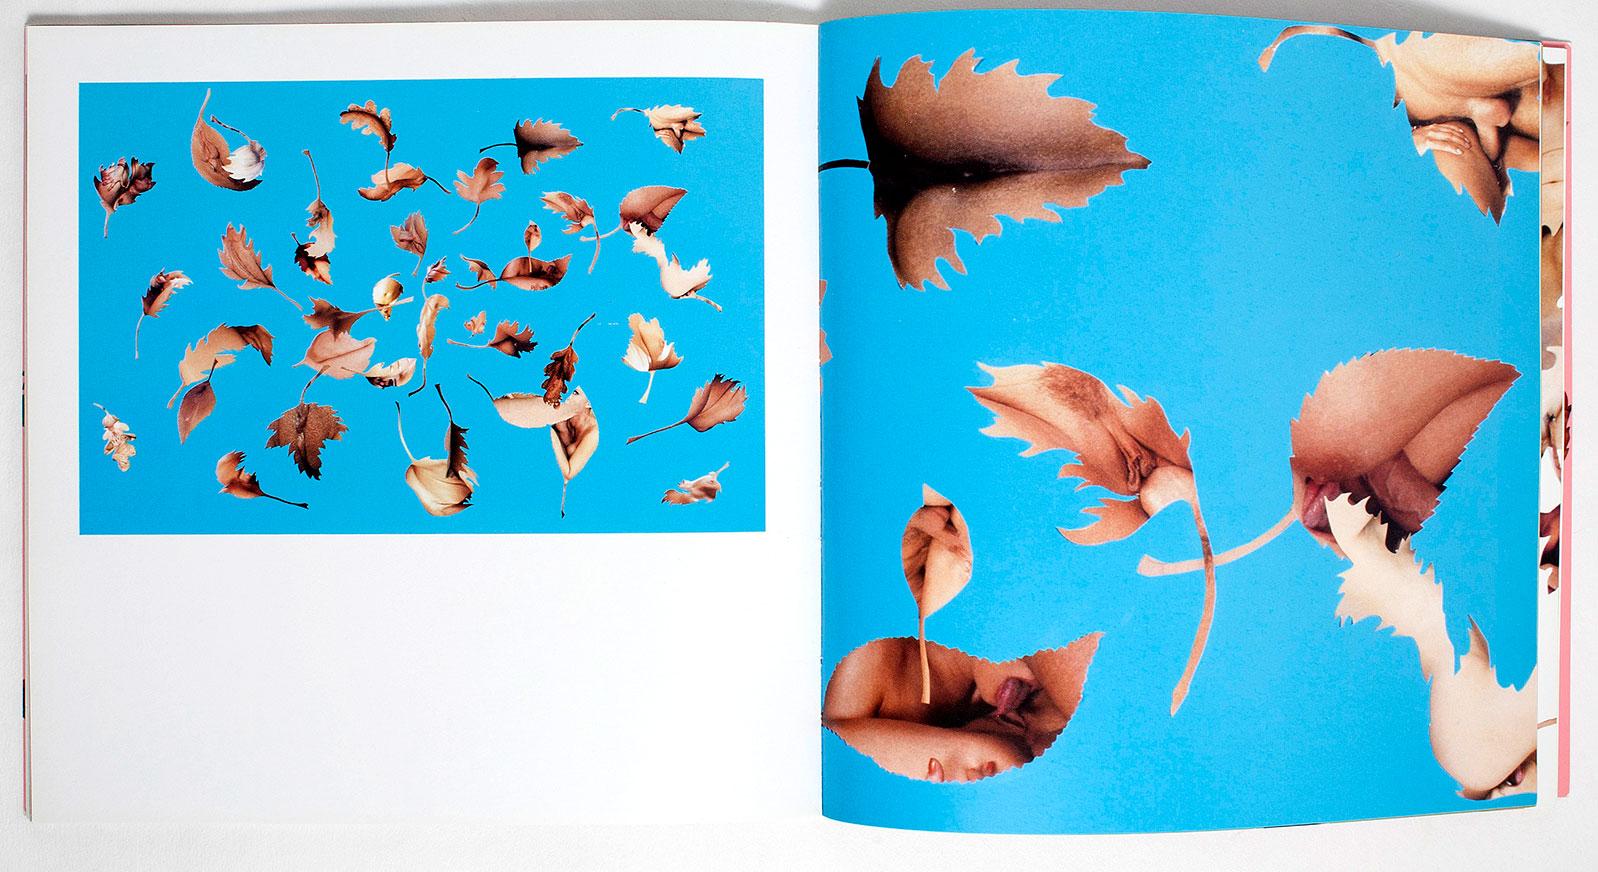 epm-print-management-bristol-jonathan-yeo-book-3.jpg